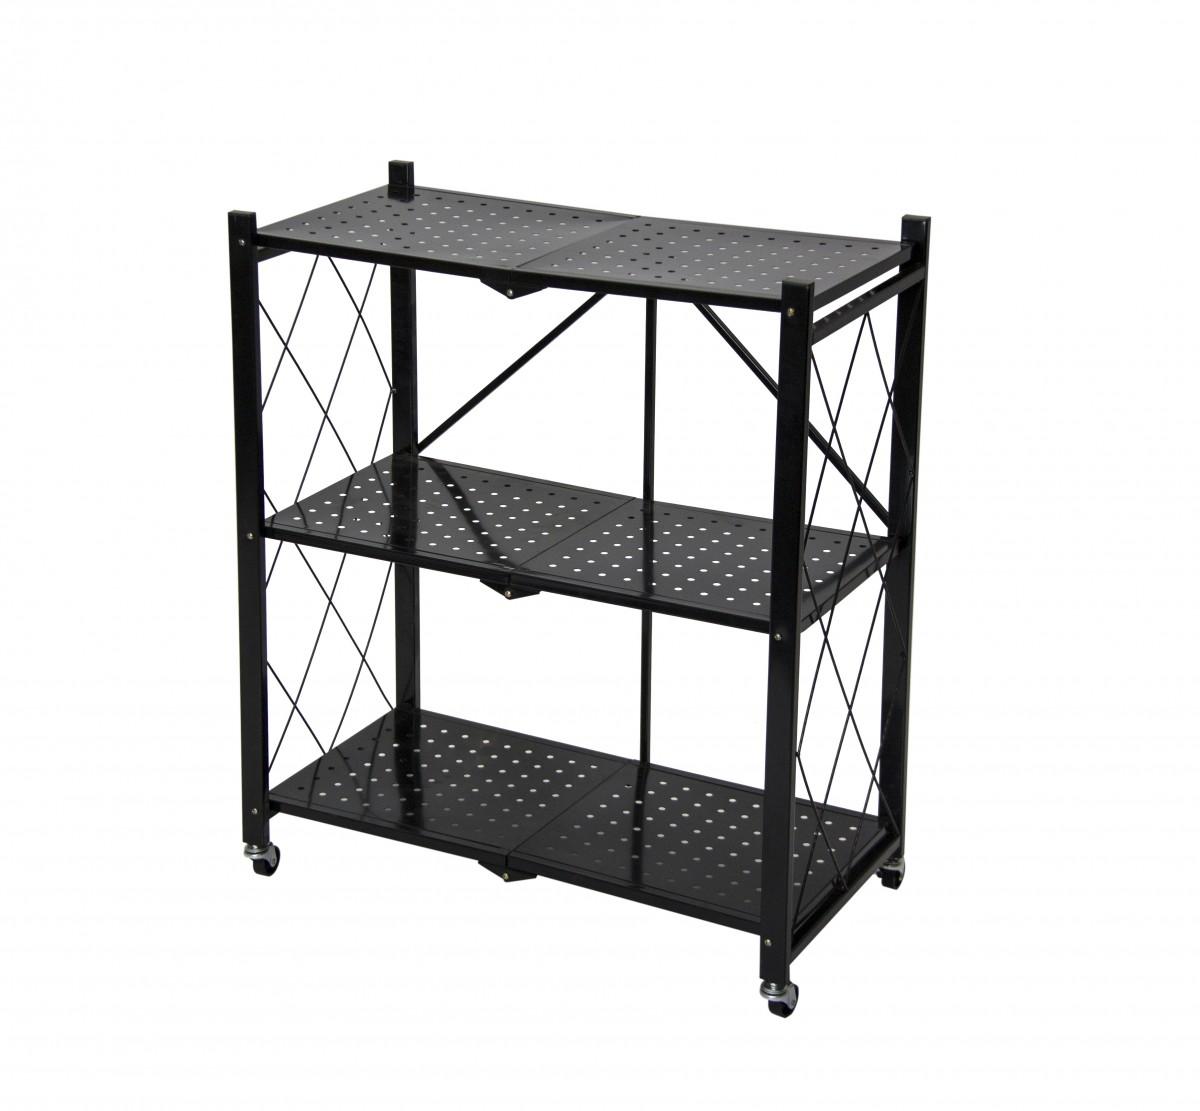 Fine Living Foldable Storage Rack-Black Metal 3 La